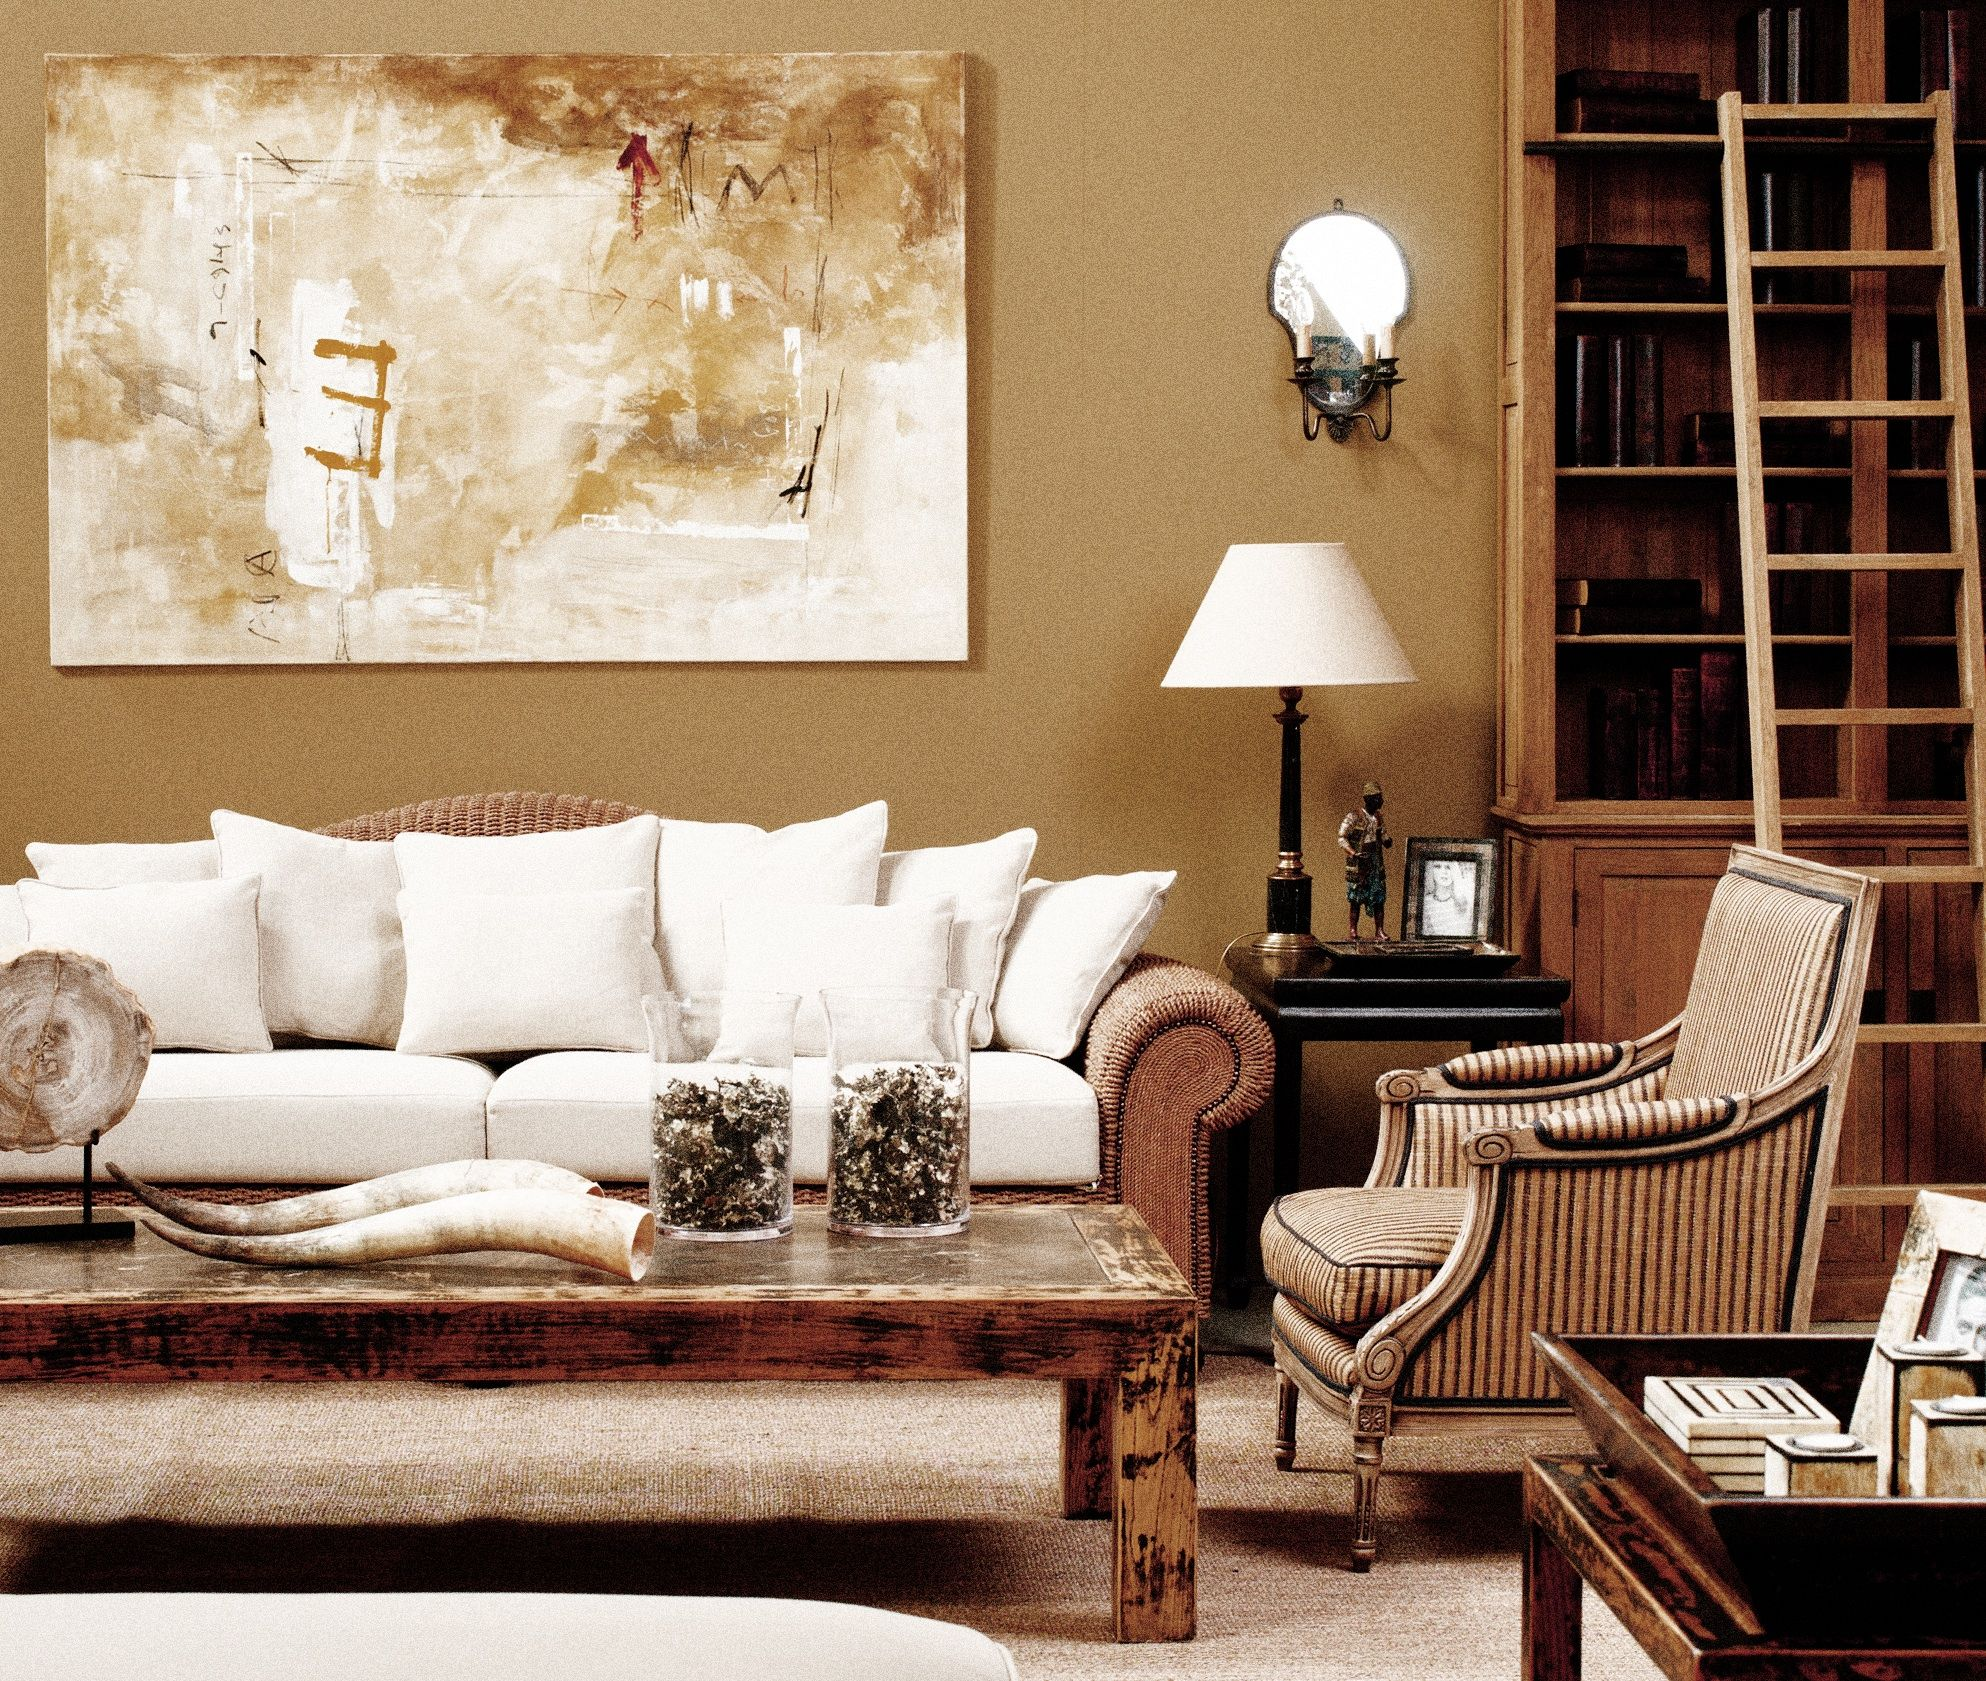 Becara interiores r sticos pinterest interiores - Becara catalogo muebles ...